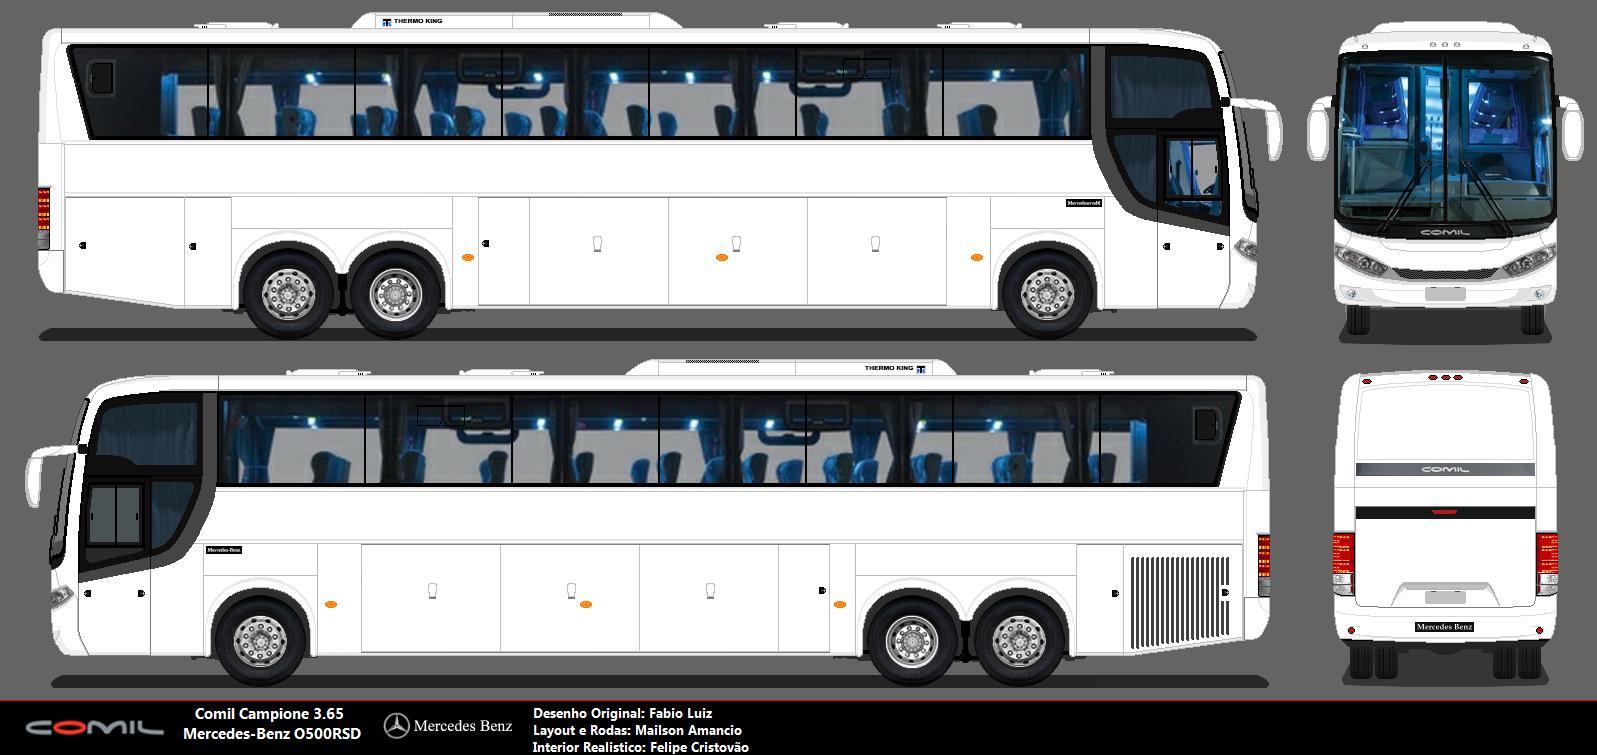 Comil campione 3 65 pttm brasil mod bus download comil campione 3 65 bus 2012 blueprint hum3d malvernweather Images